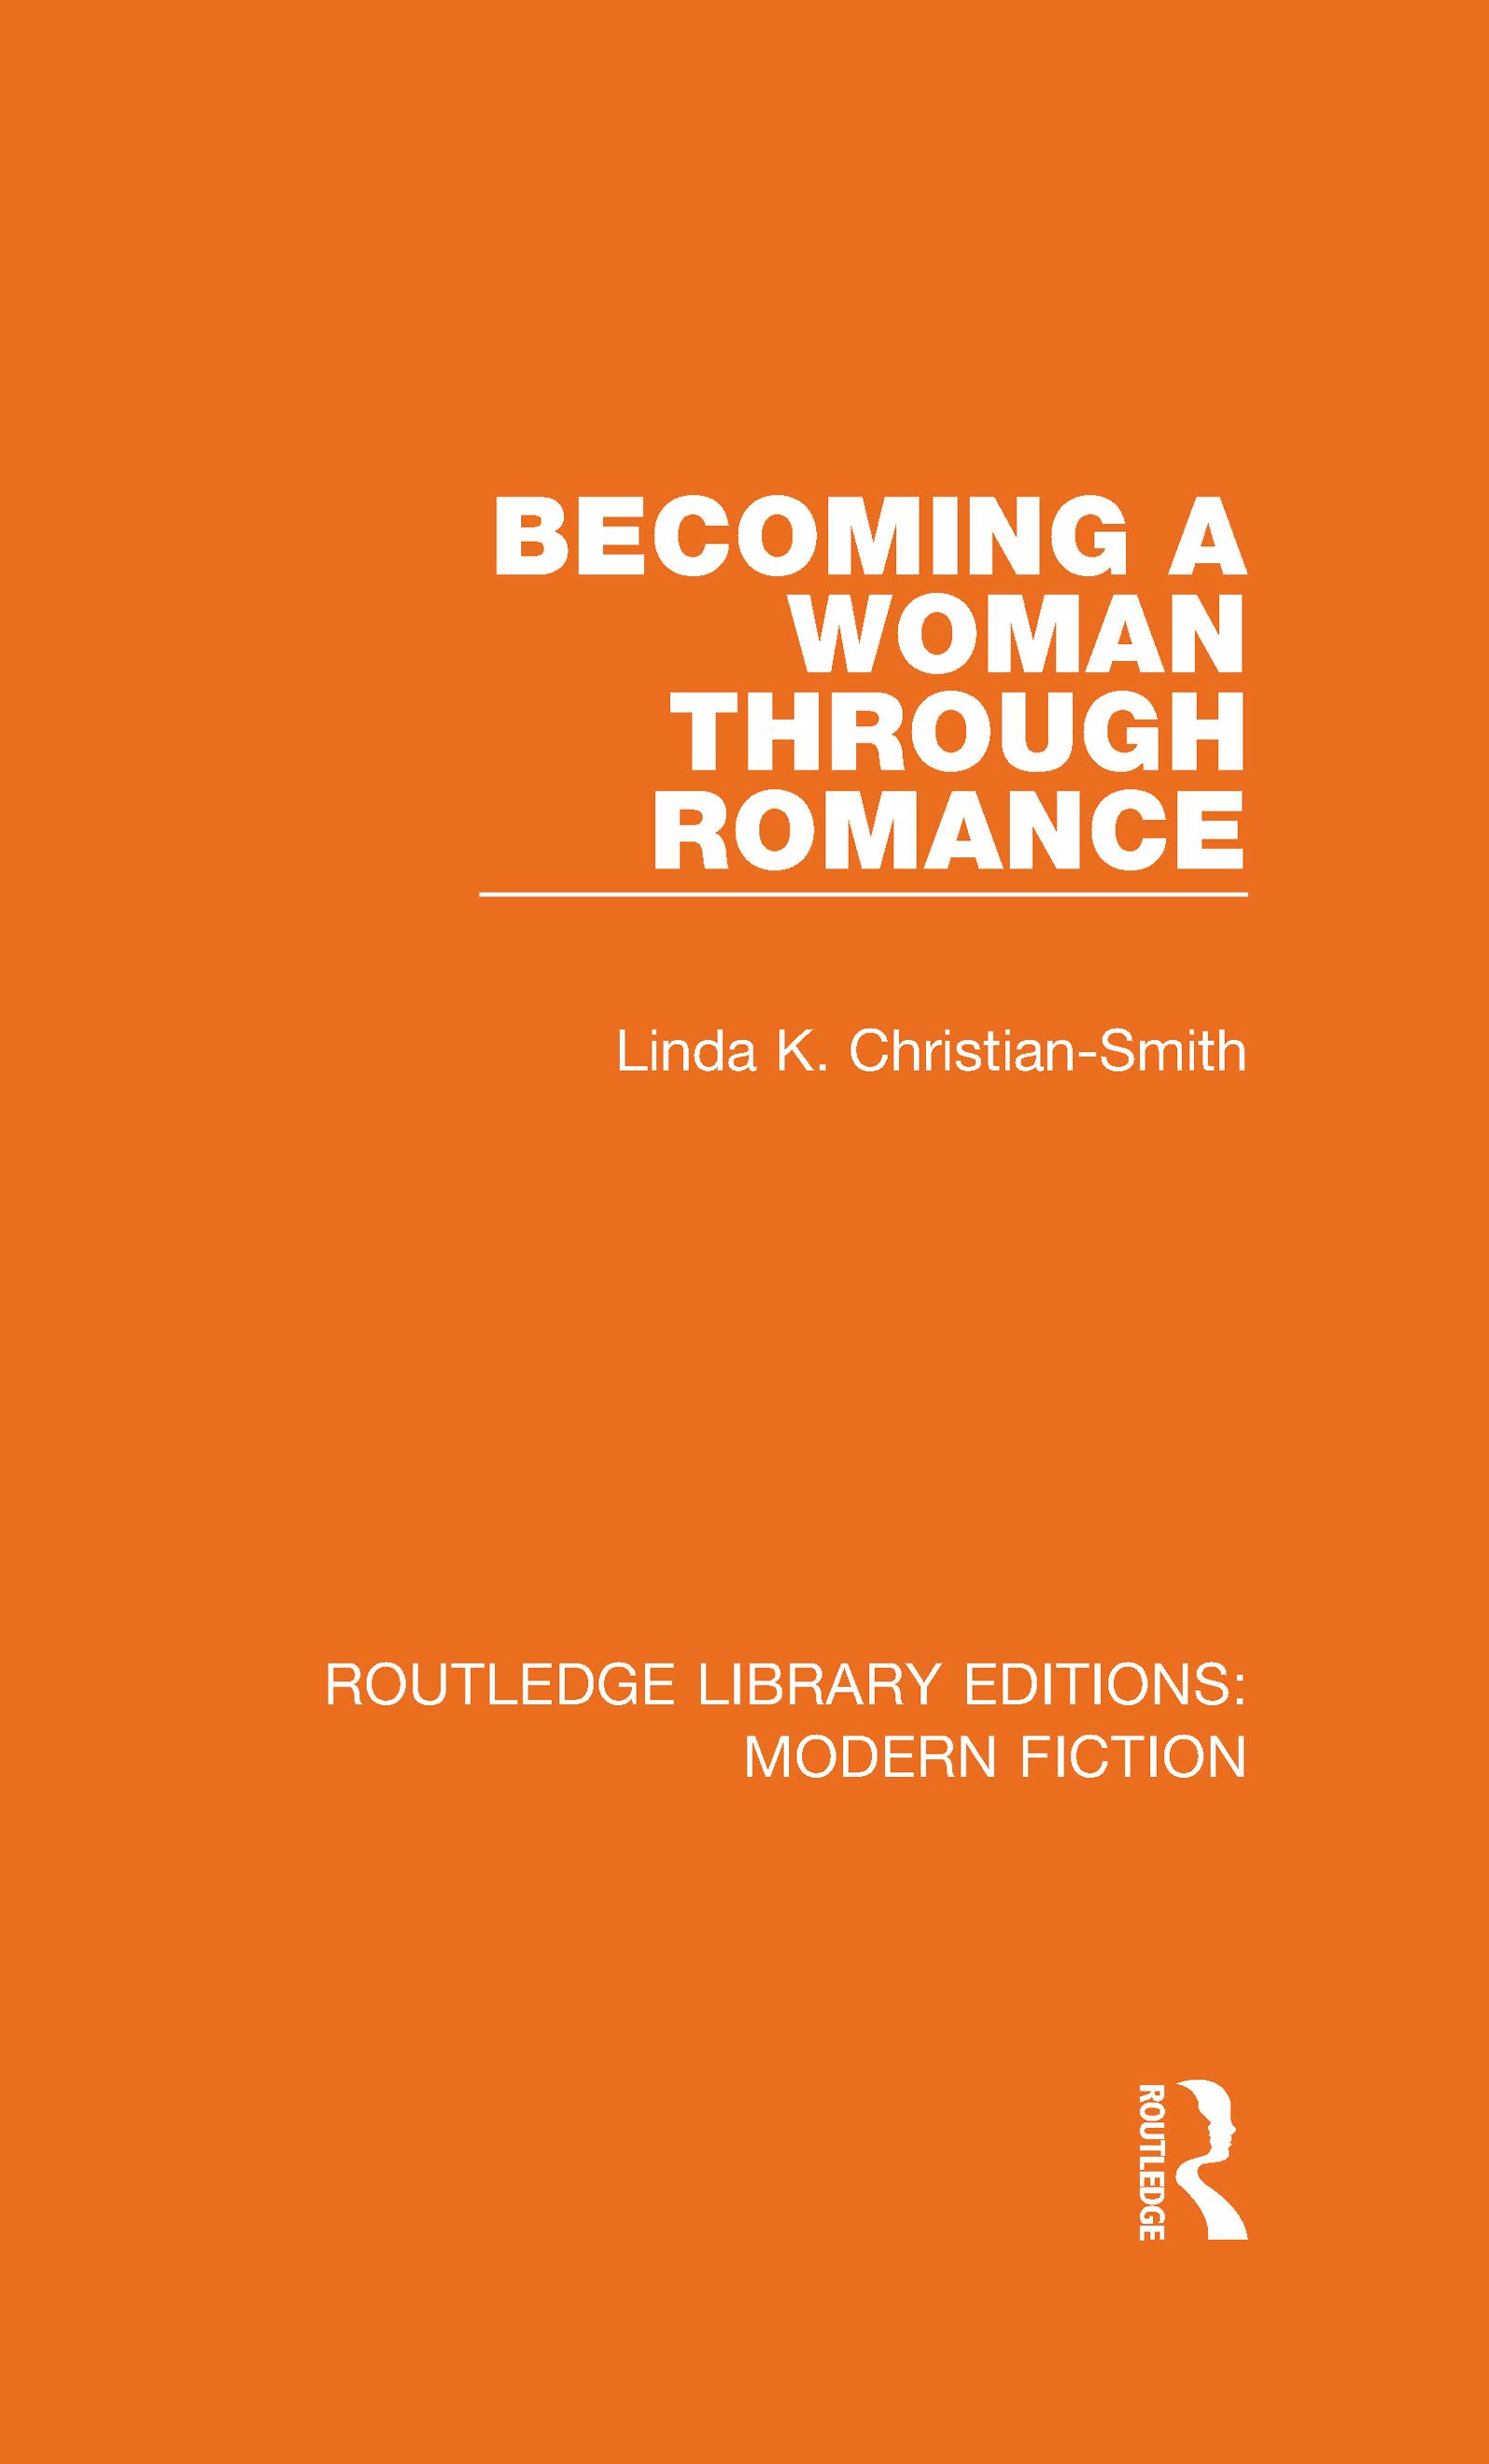 Becoming a Woman Through Romance